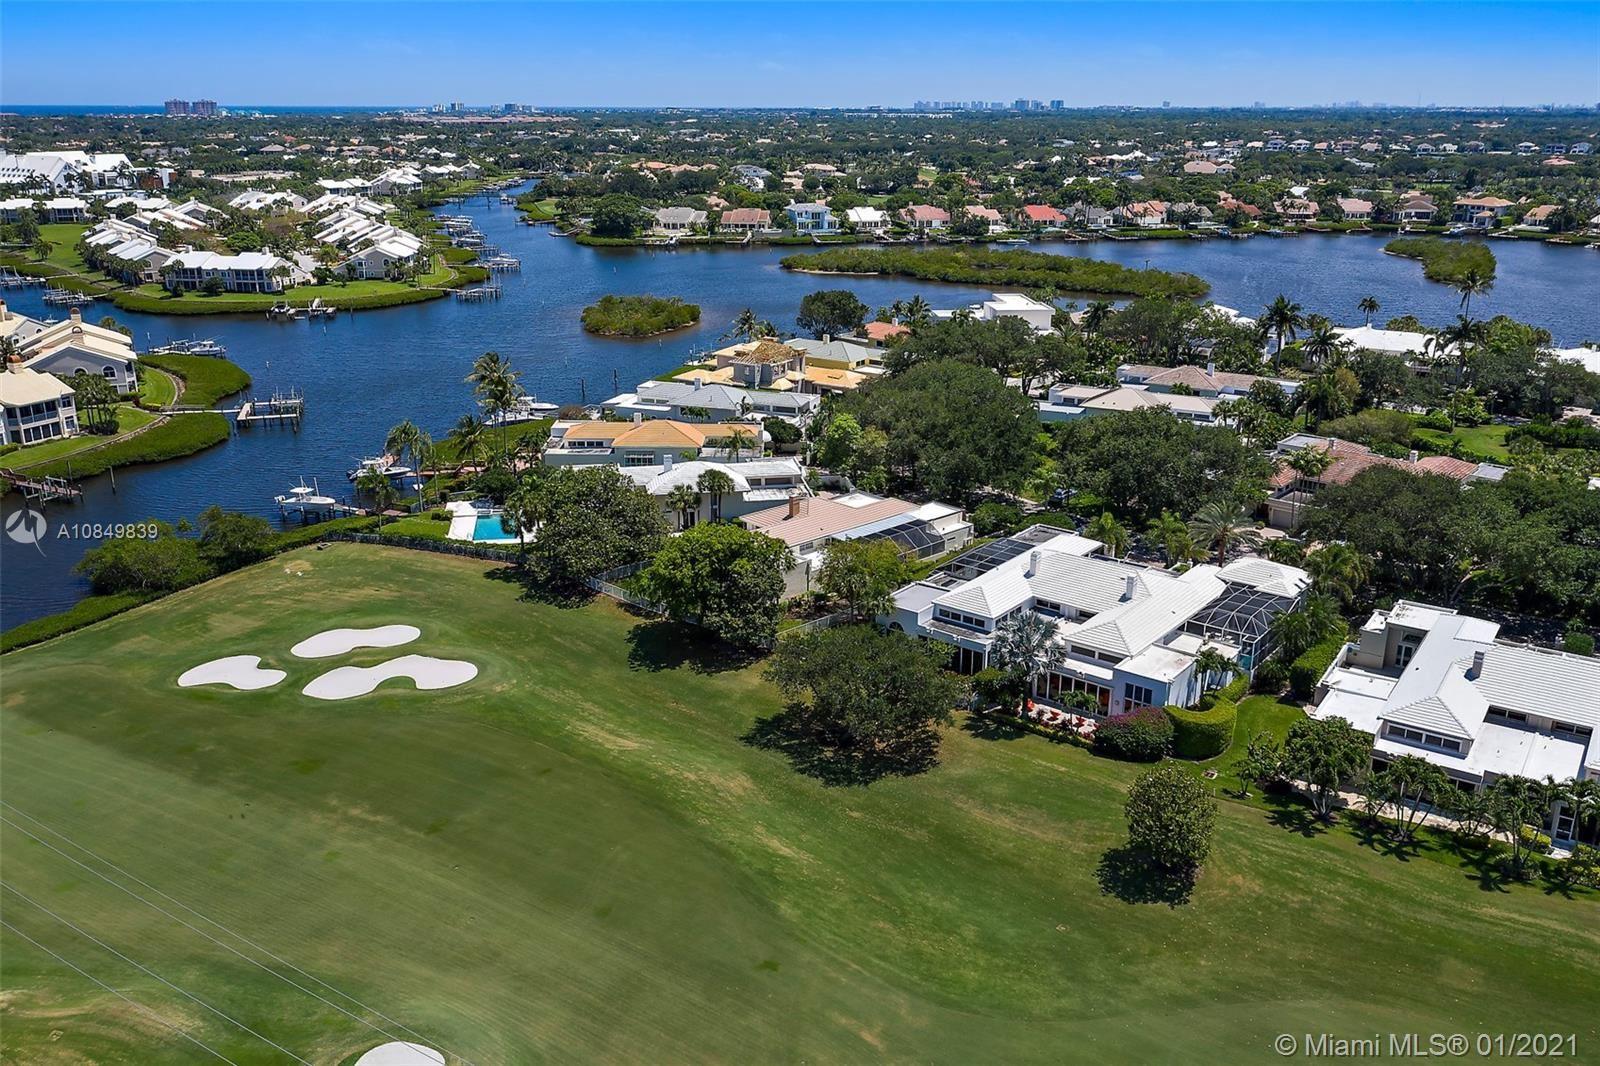 Photo of 114 Waters Edge Dr #114, Jupiter, FL 33477 (MLS # A10849839)